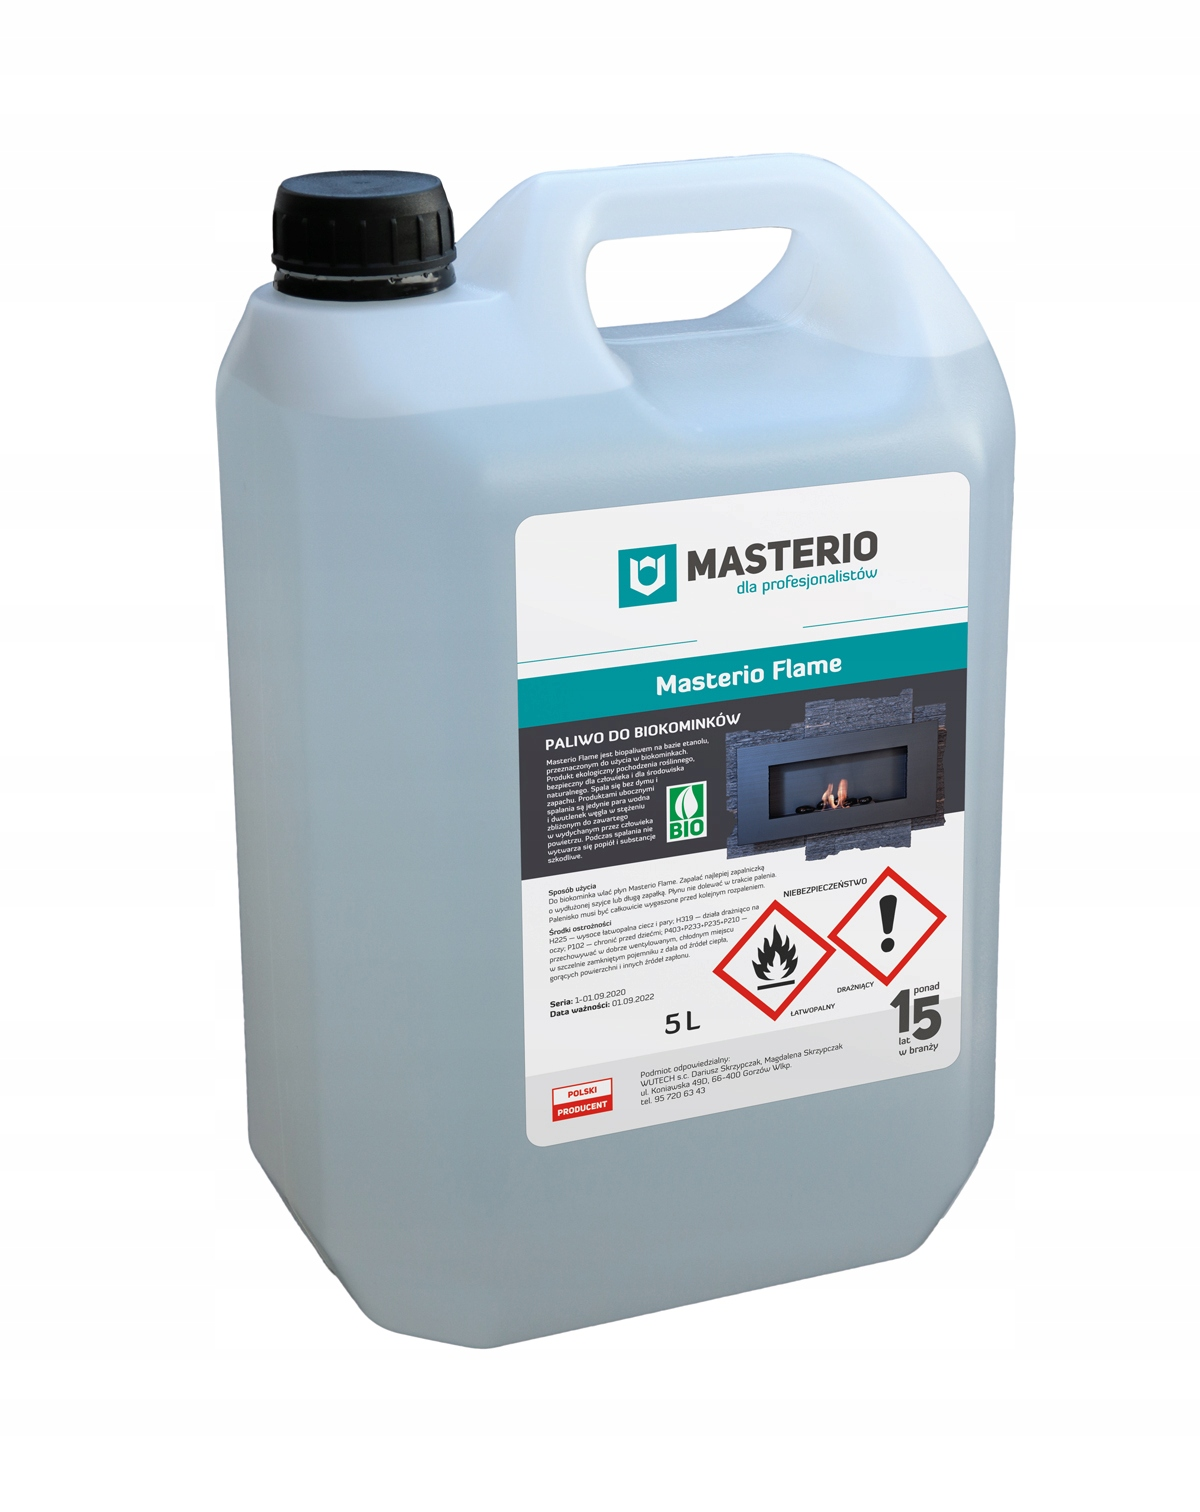 Топливо для биокаминов Masterio Flame biofuel 5L